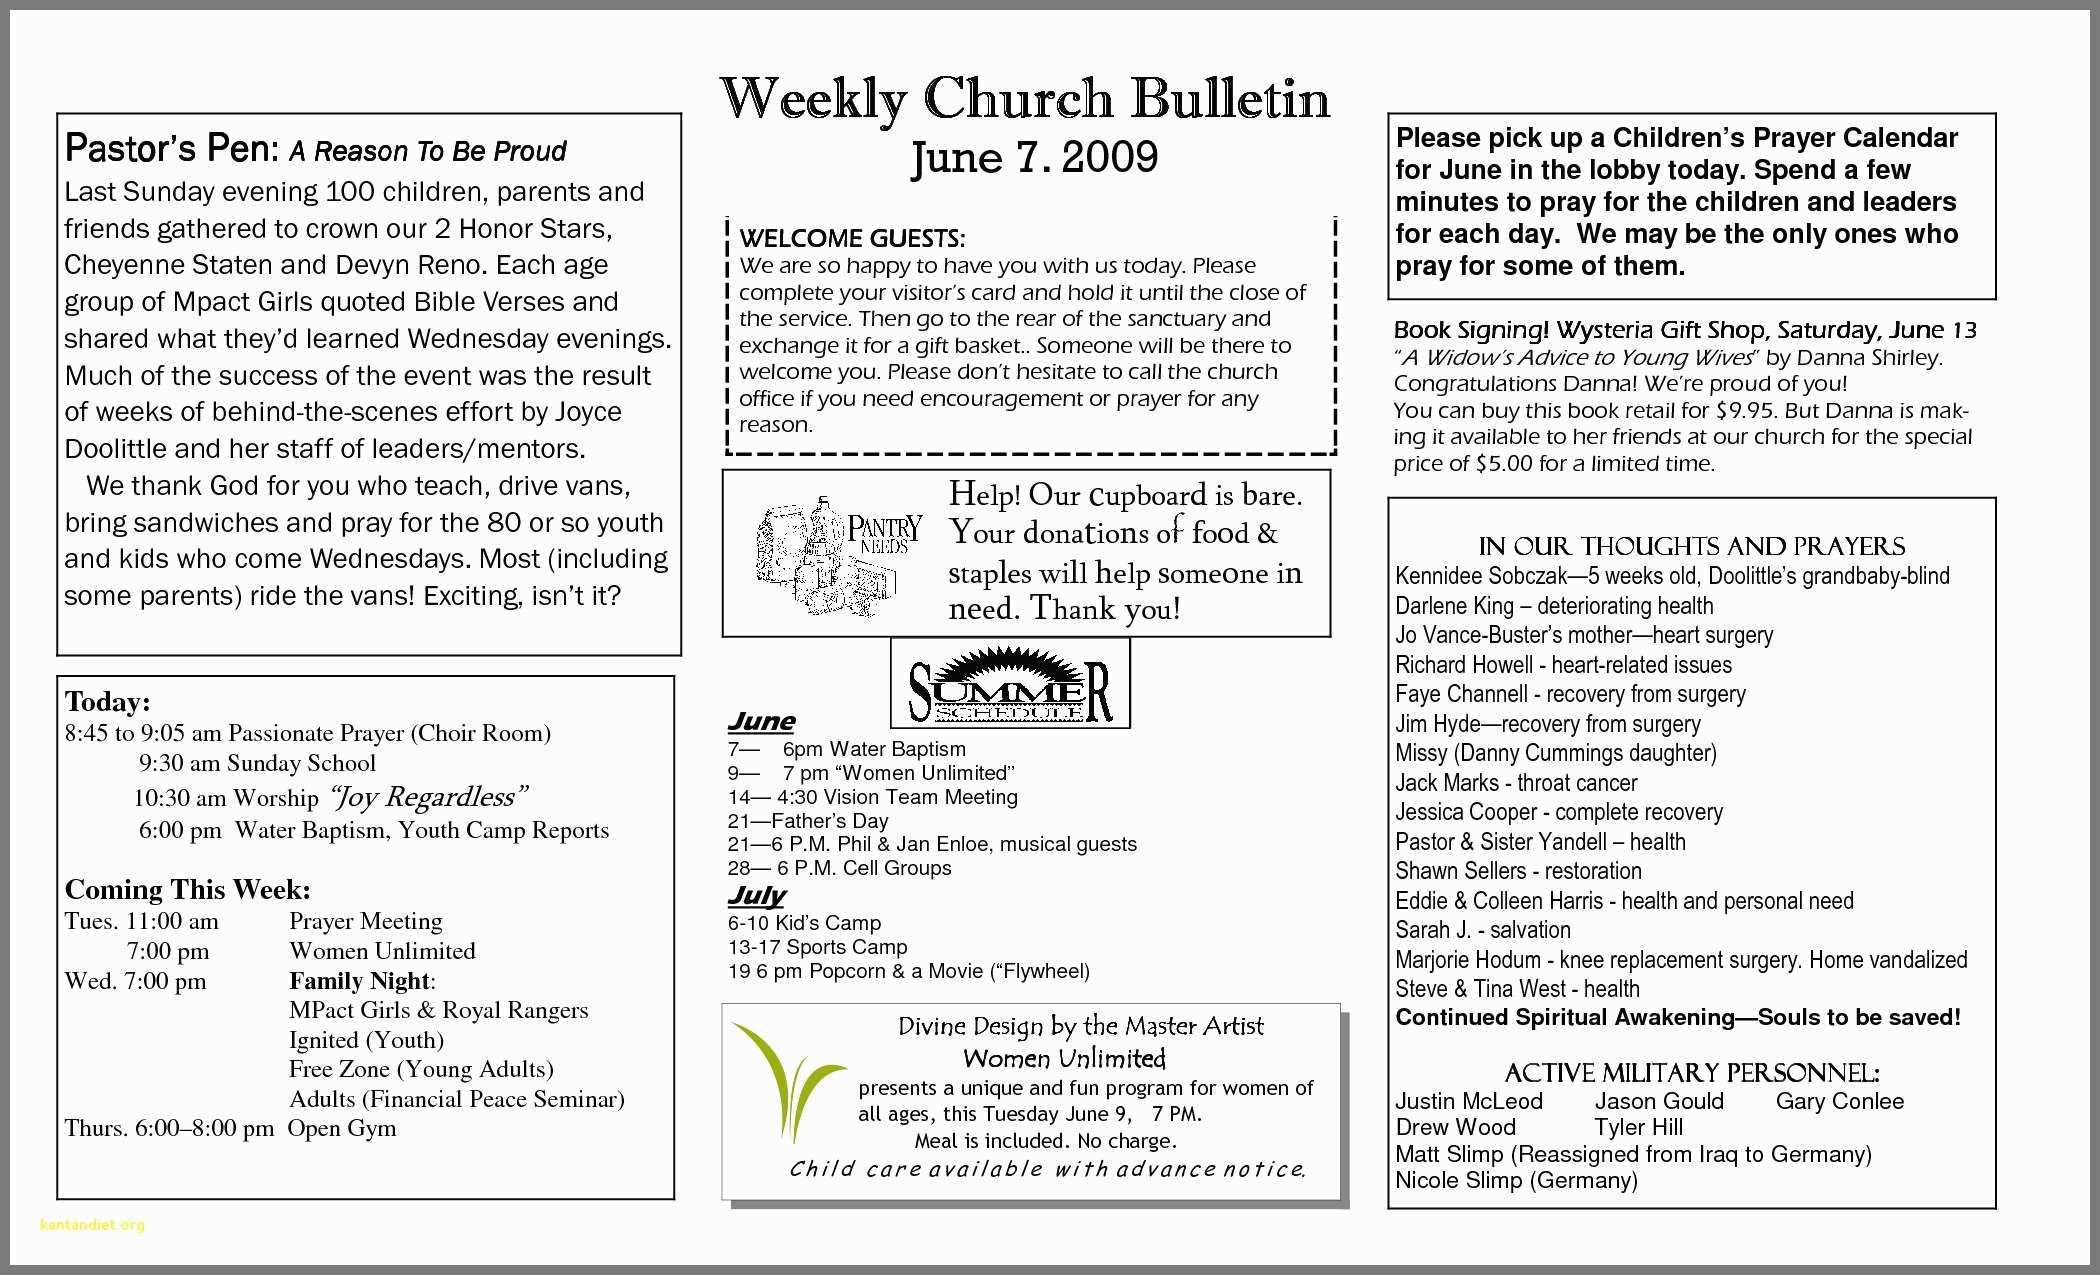 Printable Church Usher Hand Signals | Www.topsimages - Free Printable Church Usher Hand Signals